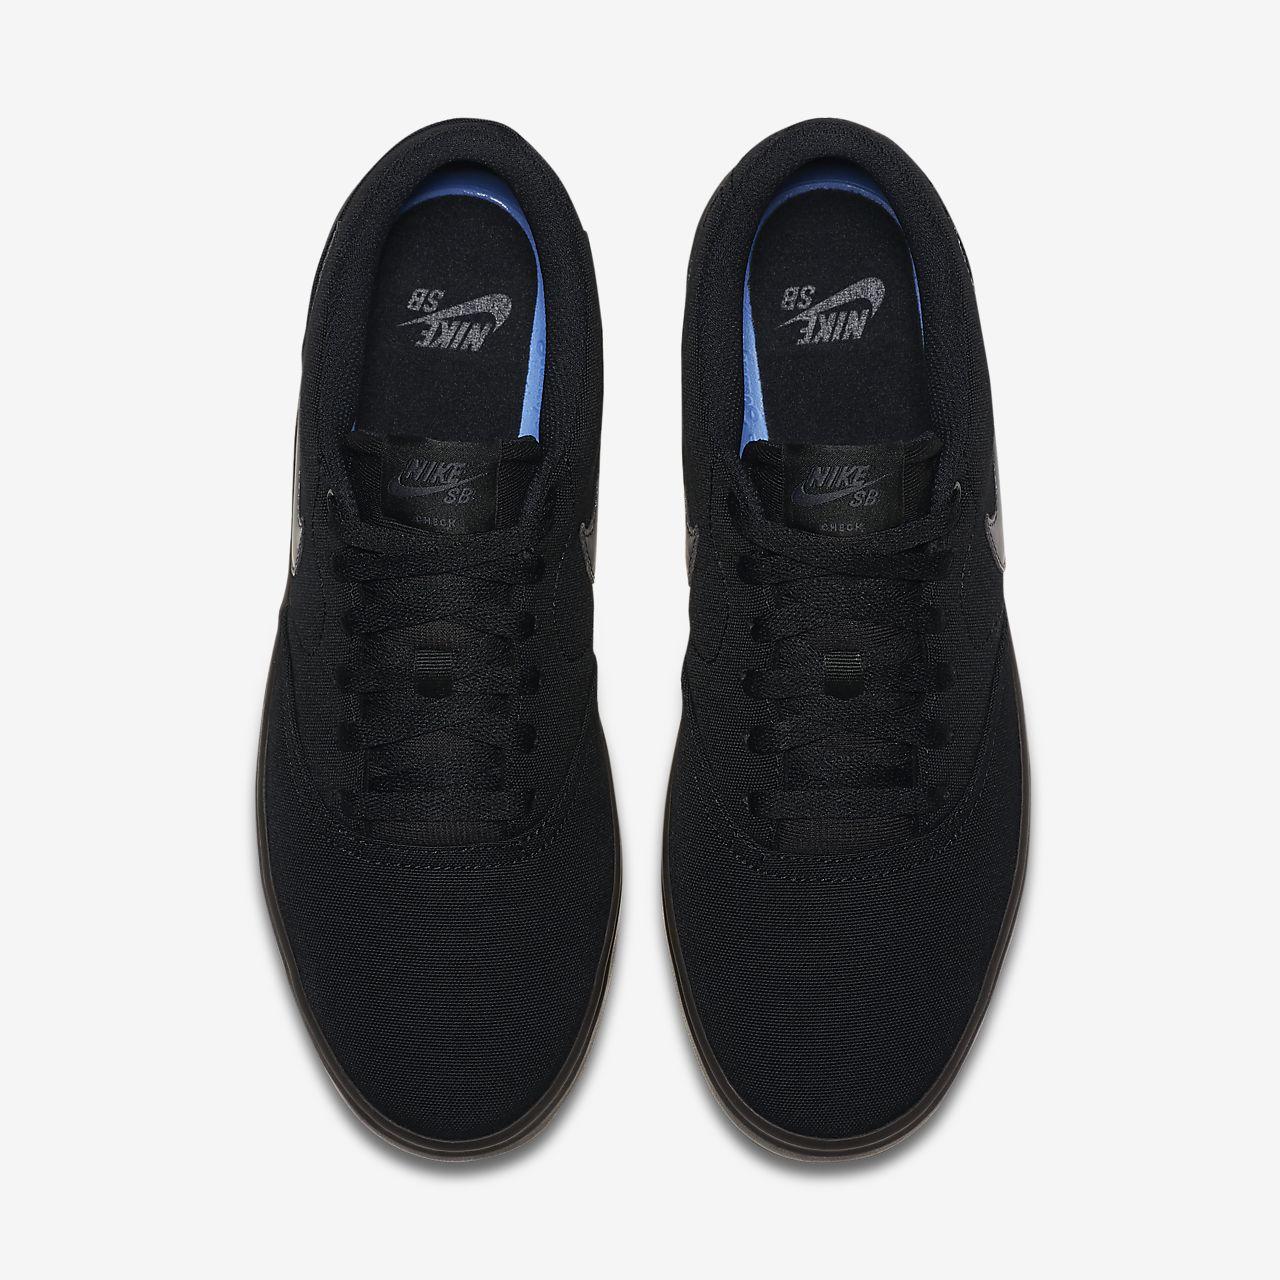 check out 54d7b c7e2b ... Chaussure de skateboard Nike SB Check Solarsoft Canvas pour Homme